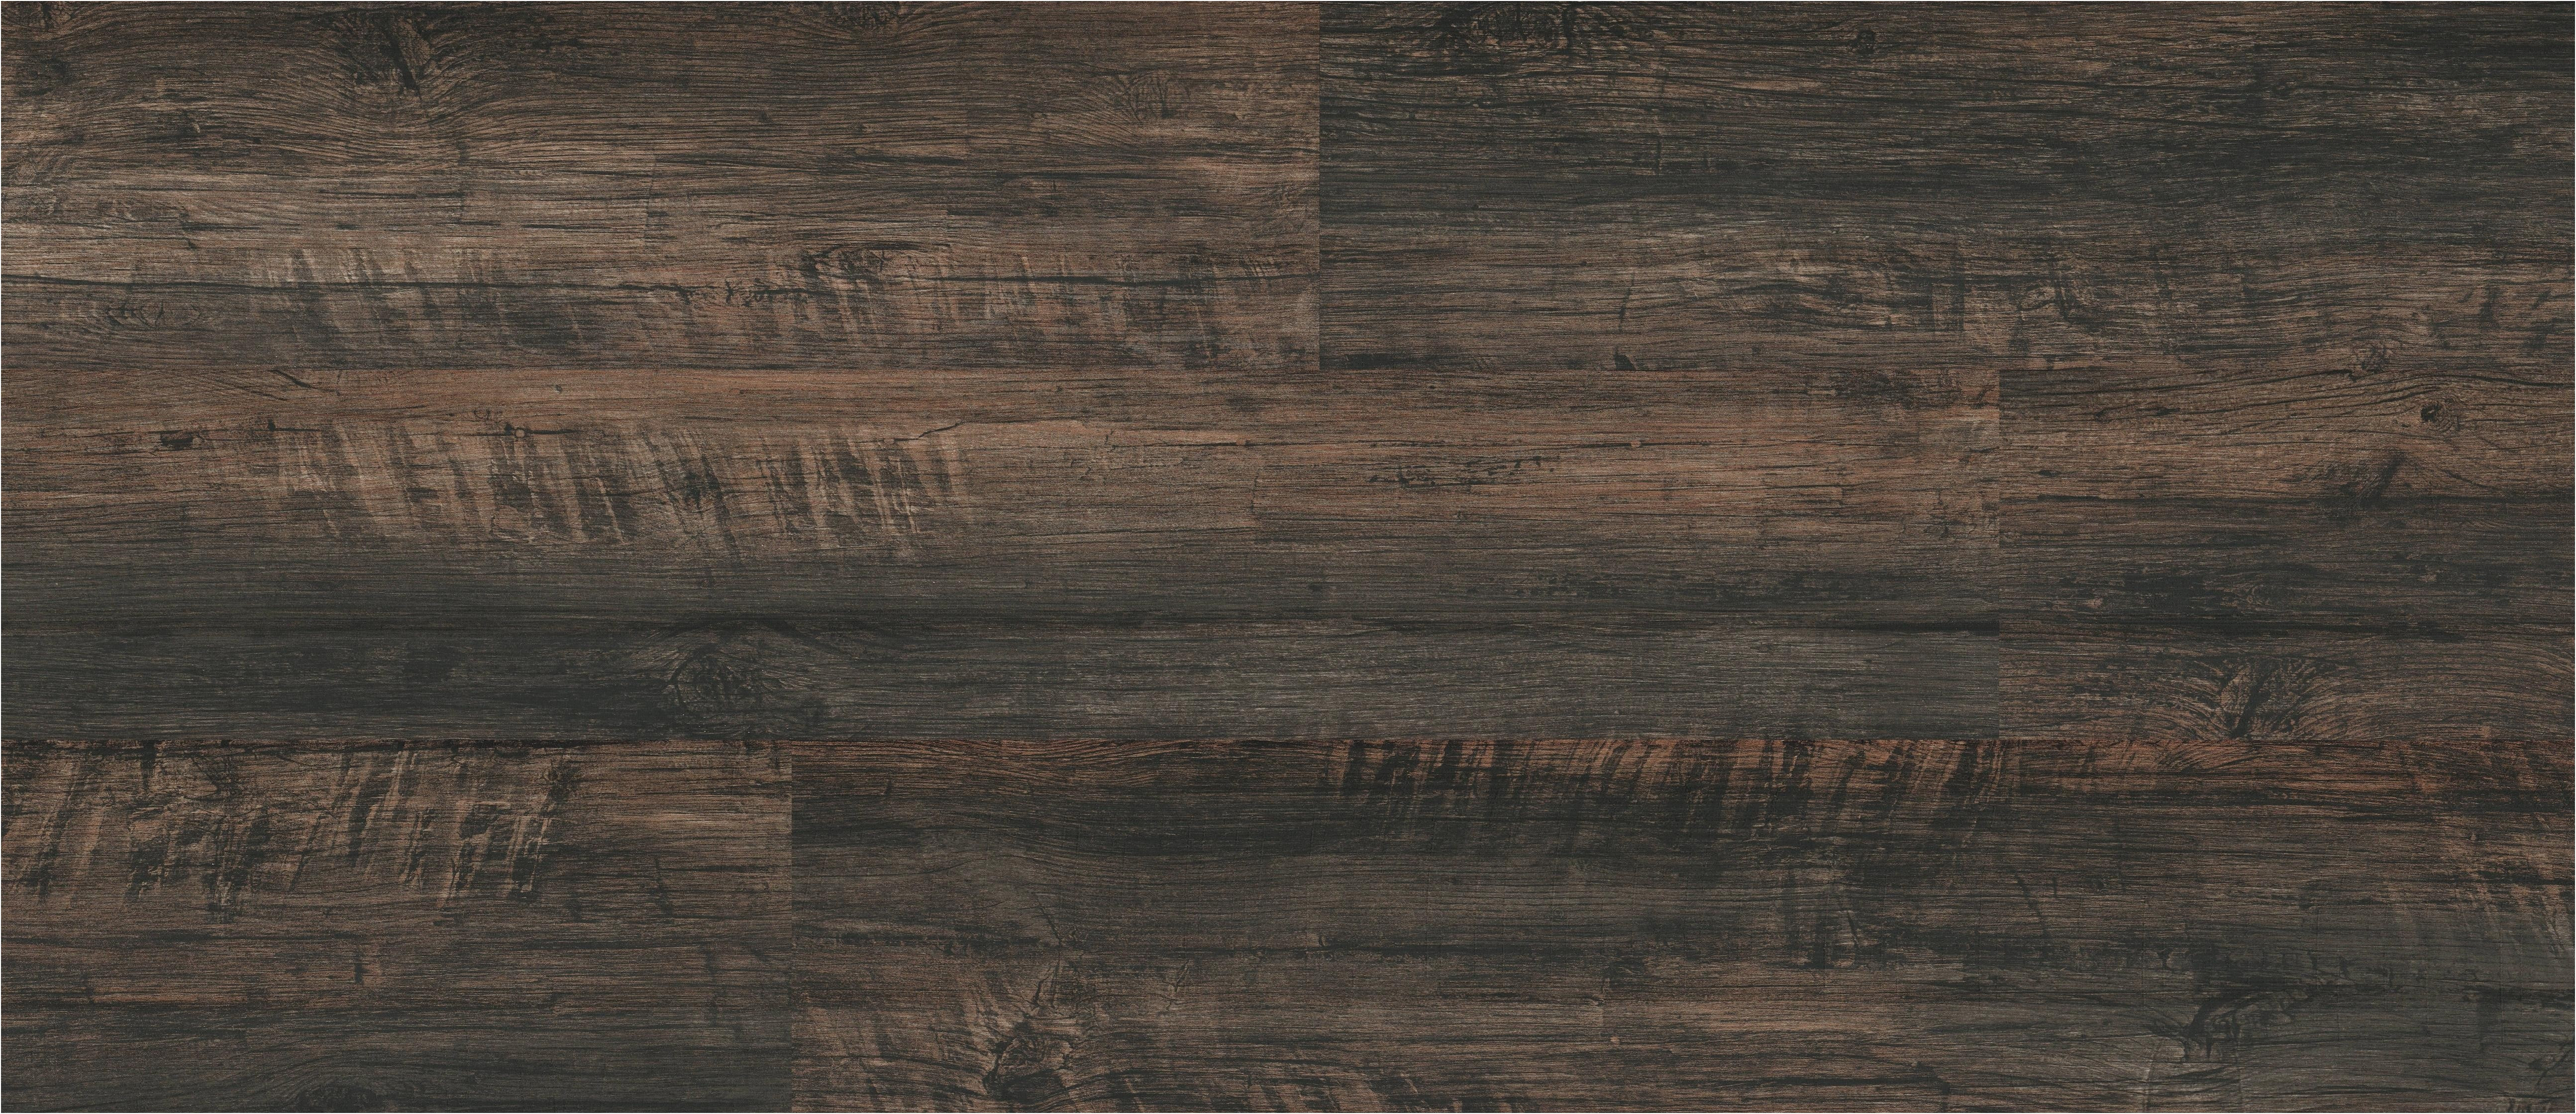 vinyl hardwood flooring of snap vinyl plank flooring www topsimages com throughout vesdura vinyl plank flooring awesome snap to her vinyl flooring of vesdura vinyl plank flooring jpg